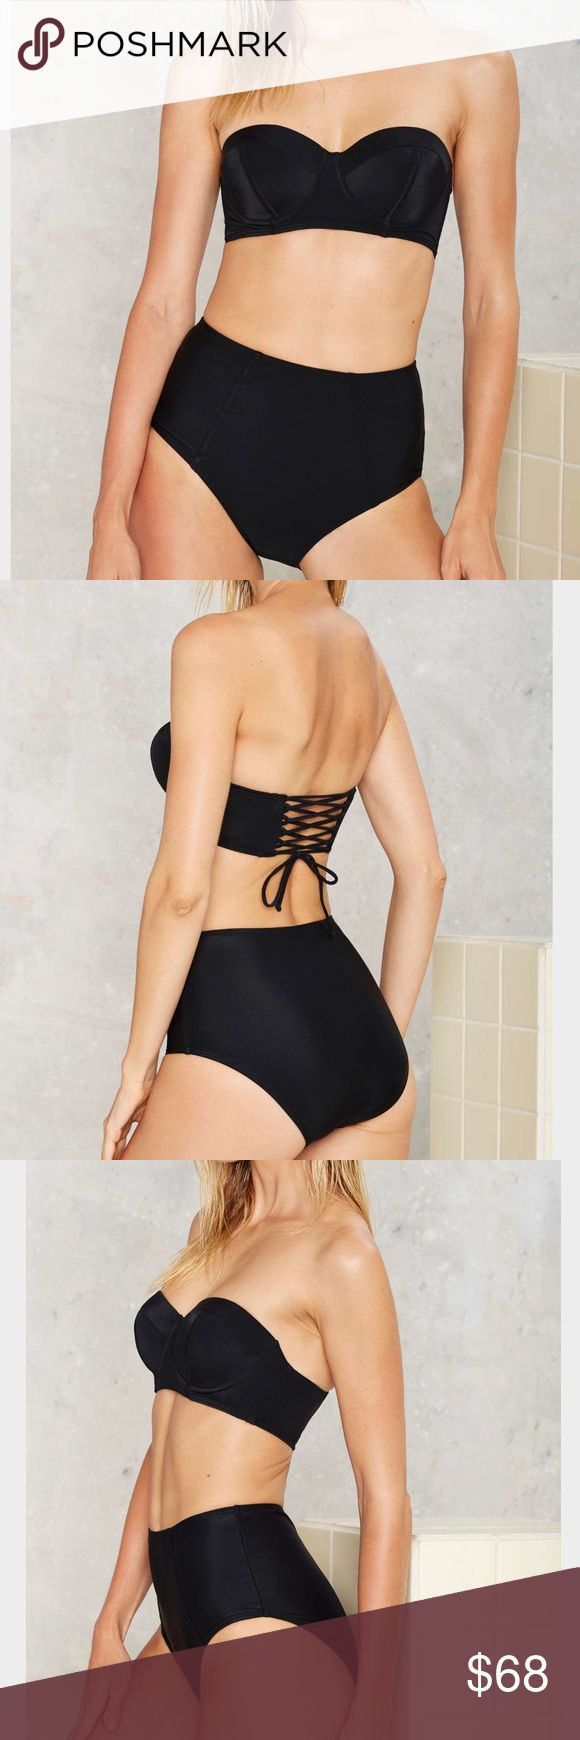 Nasty Gal Women's Black Justina Bikini Set Nasty Gal Women's Black Justina Bikini Set by Beach Joy Nasty Gal Swim Bikinis